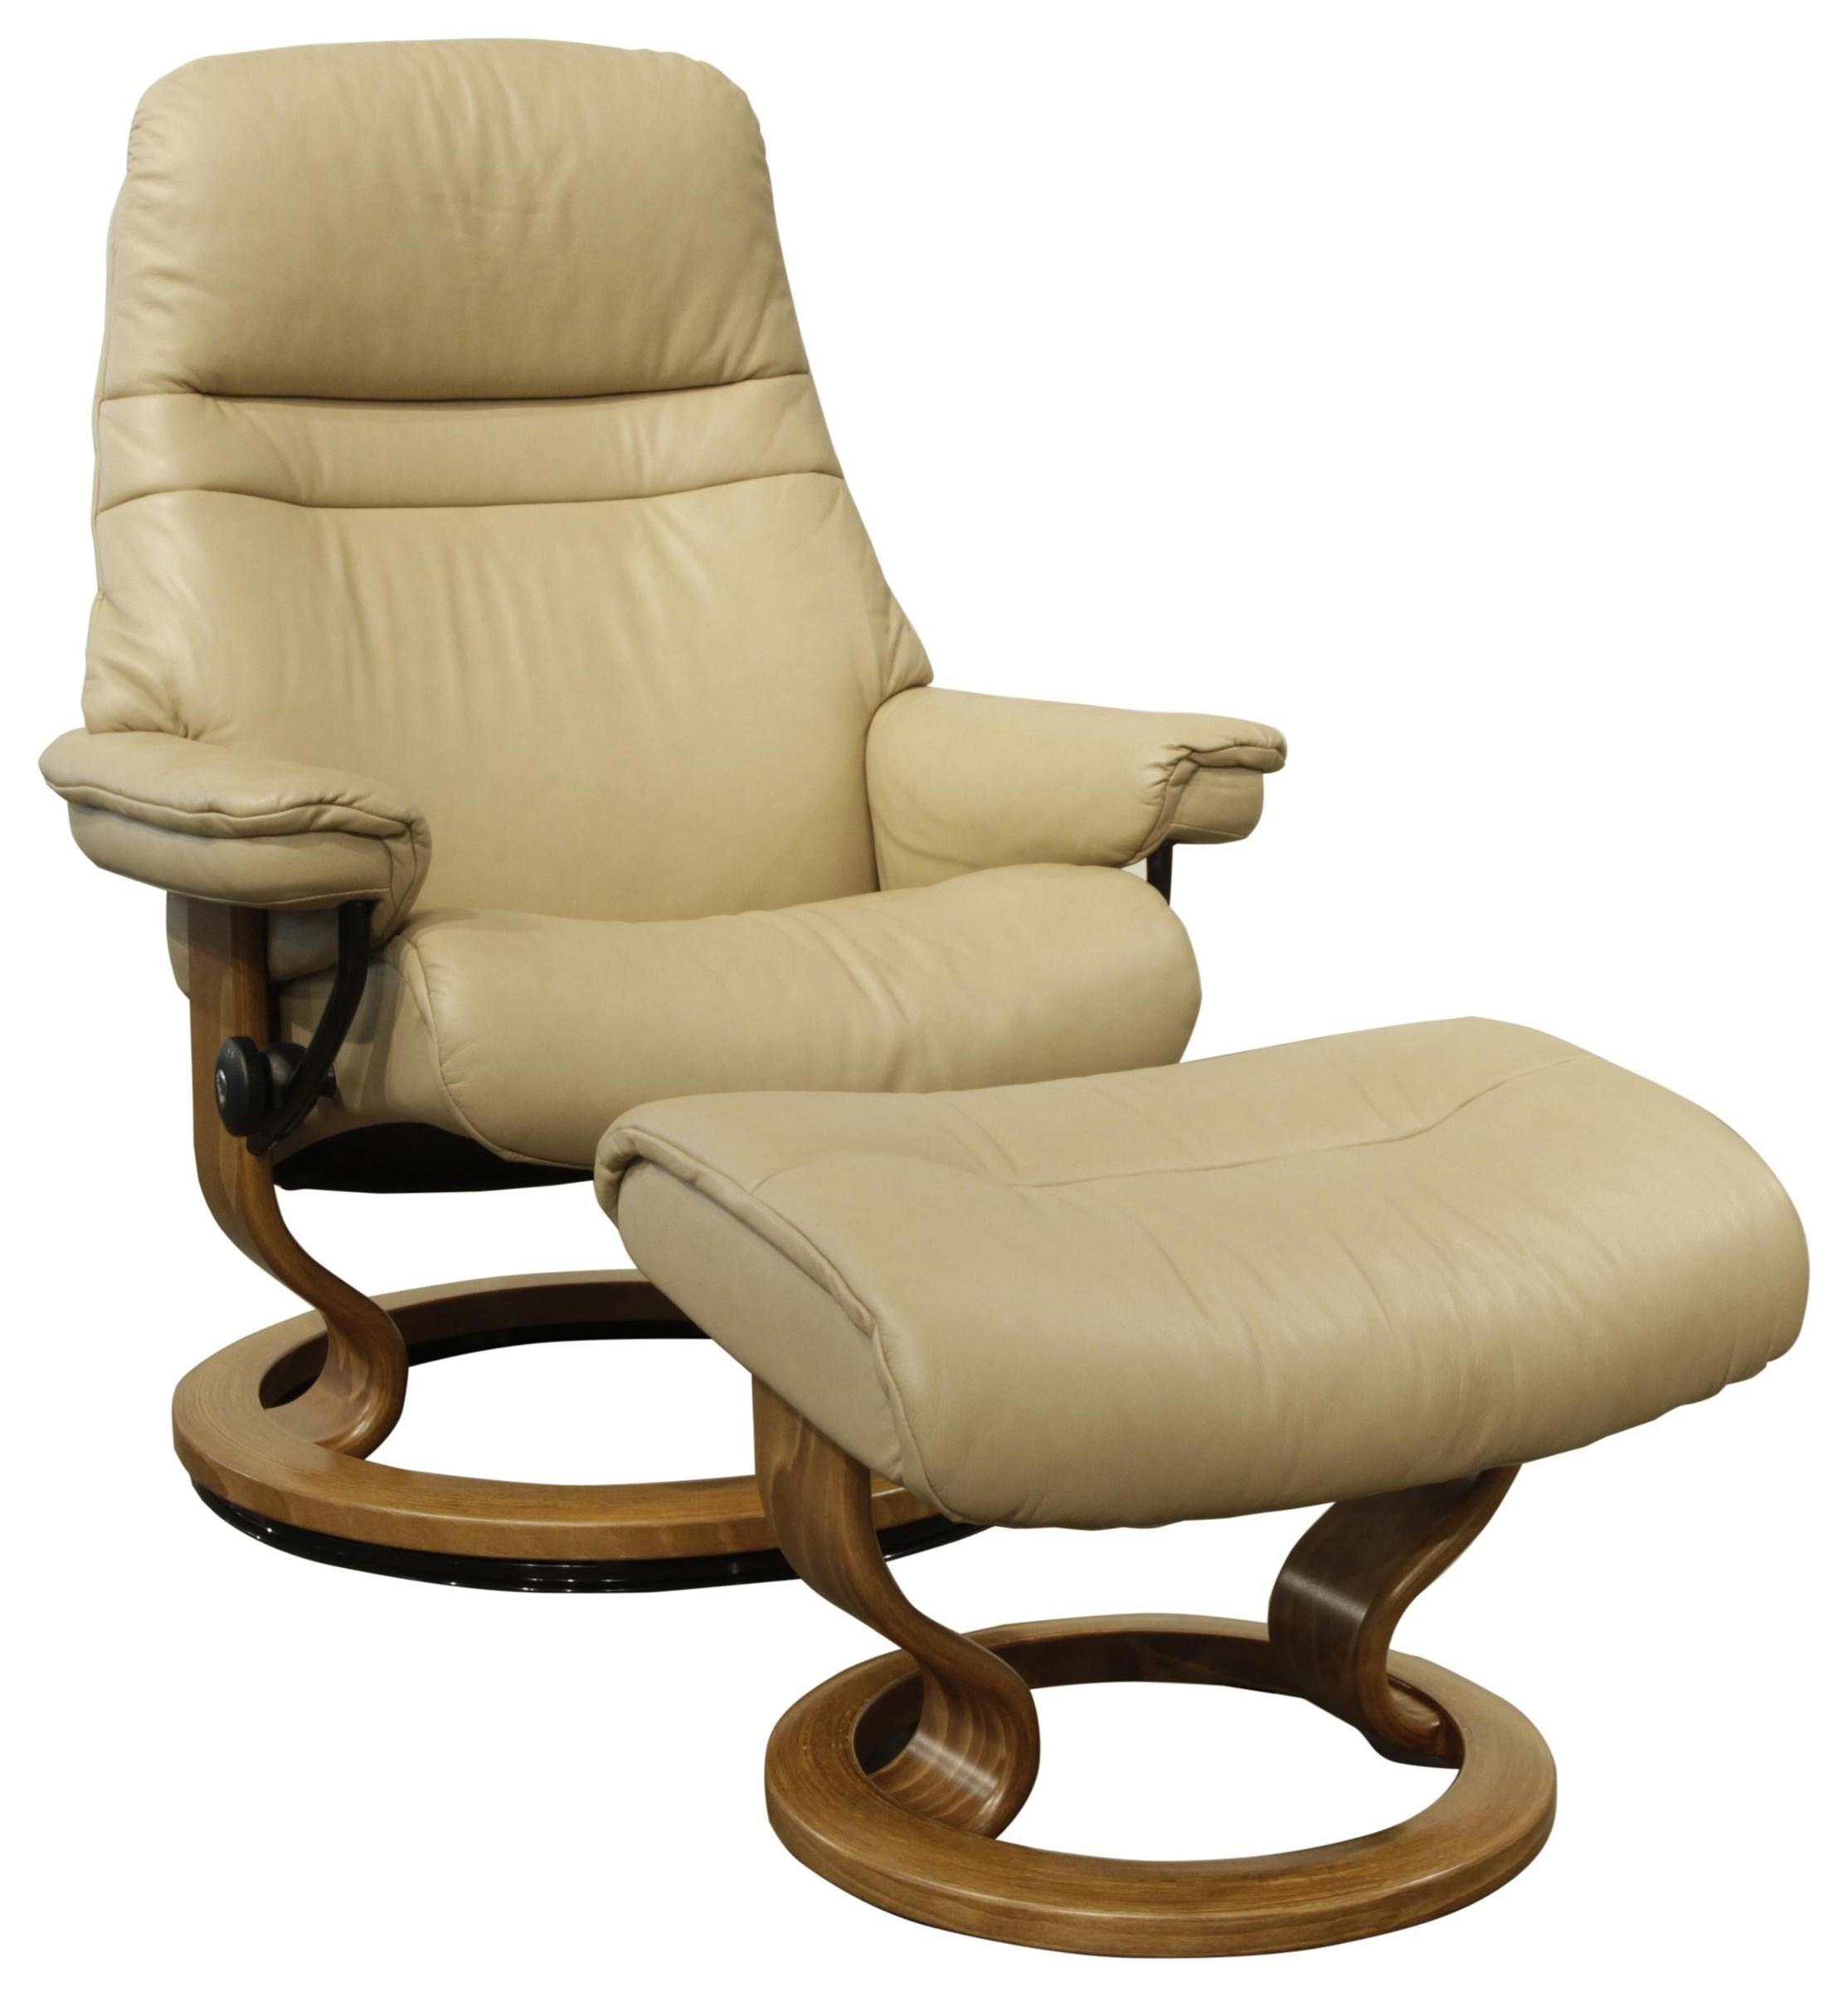 Sunrise Small Stressless Chair & Ottoman by Stressless at HomeWorld Furniture